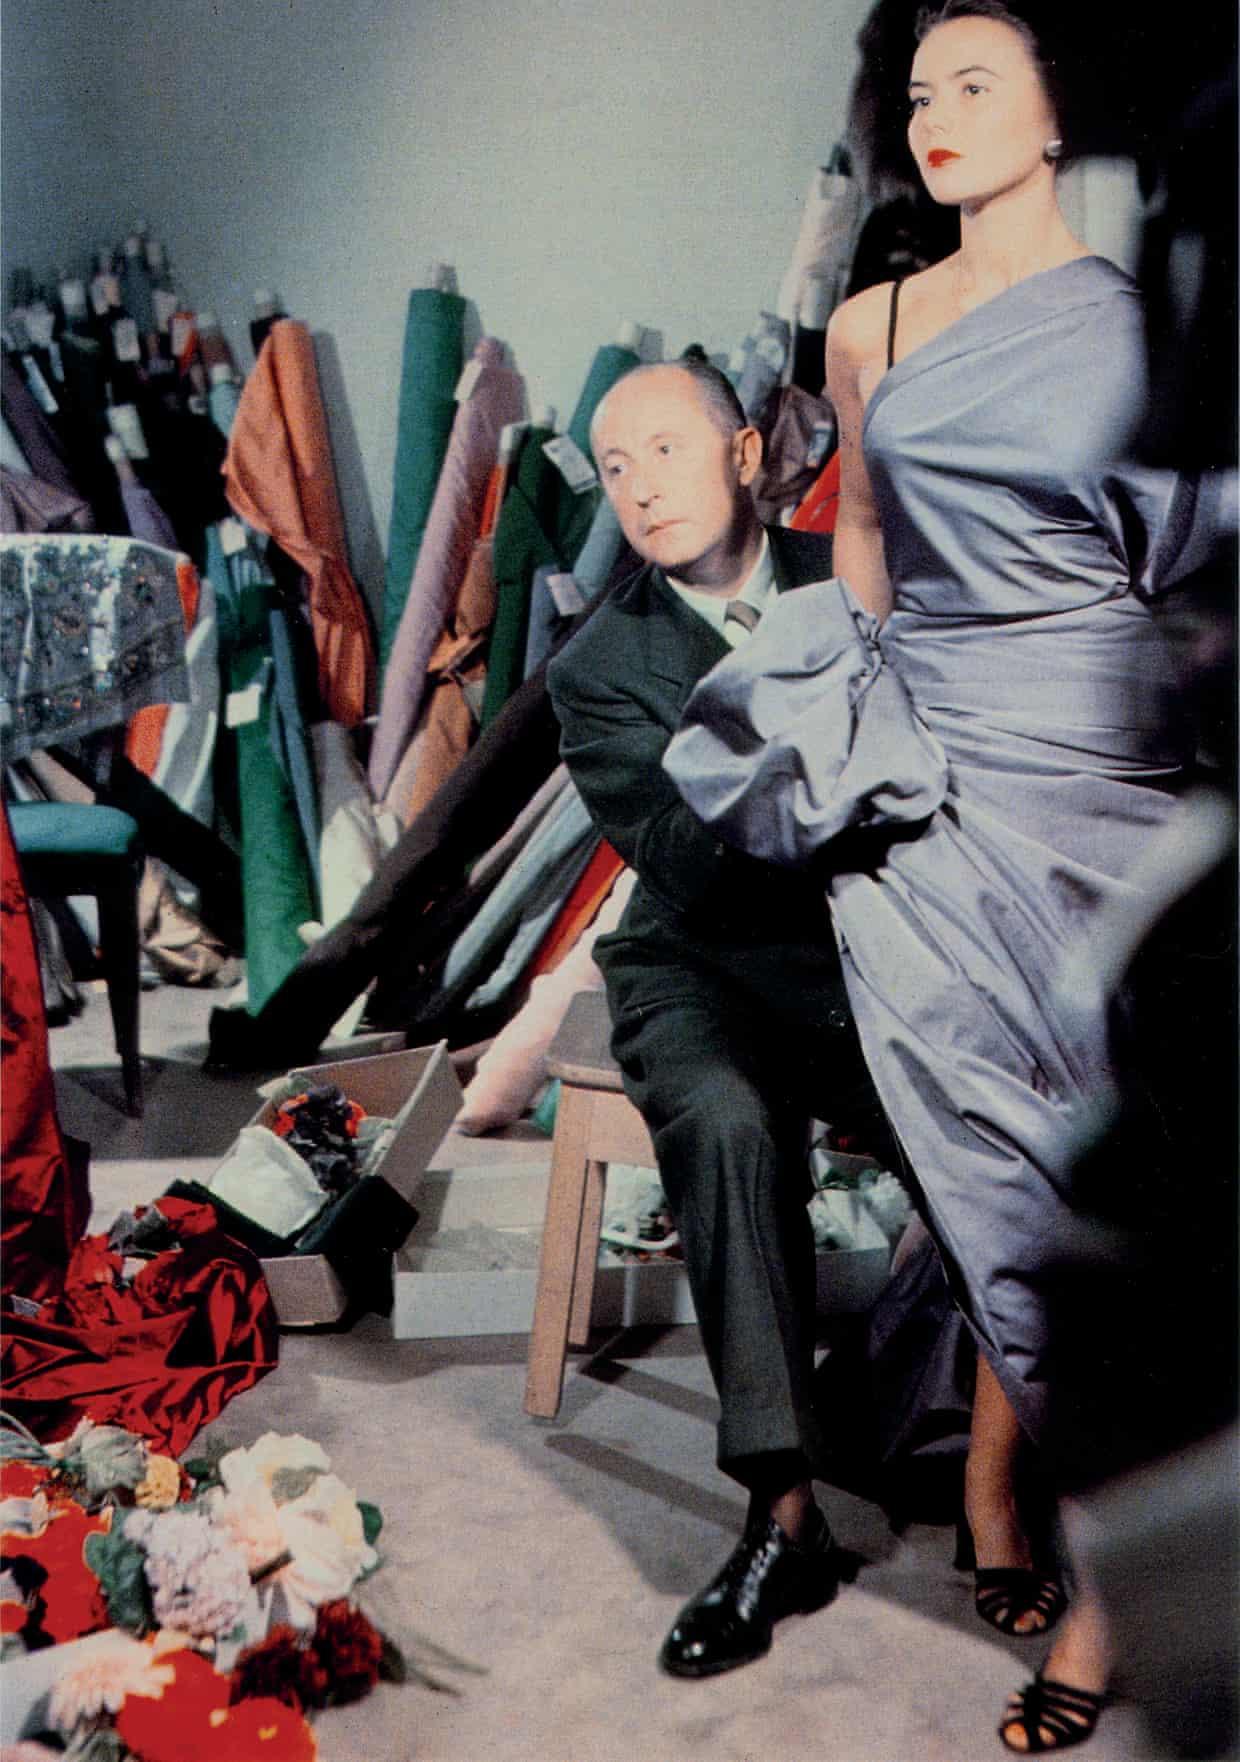 Christian Dior with model Sylvie, circa 1948, Courtesy of Christian Dior